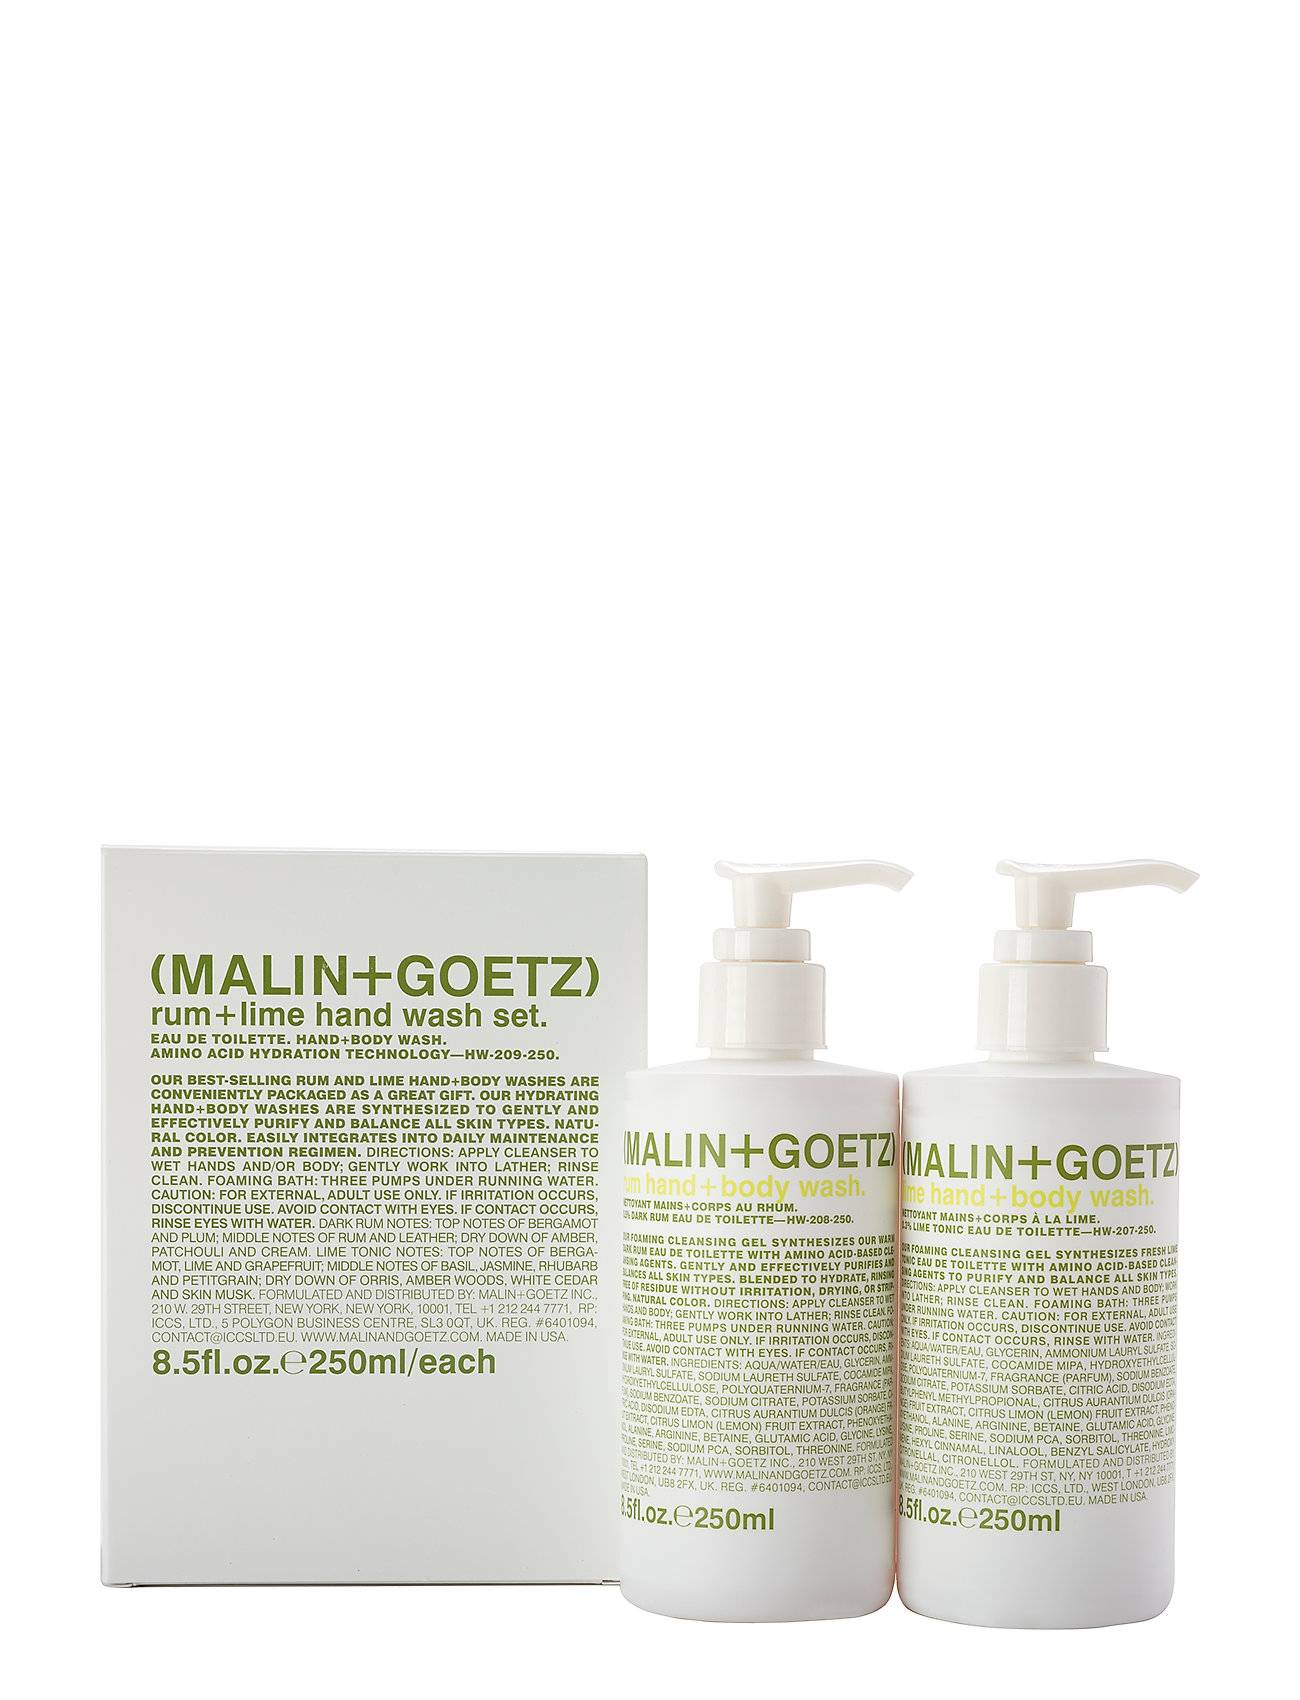 Malin+Goetz Rum+ Lime Hand Wash Set